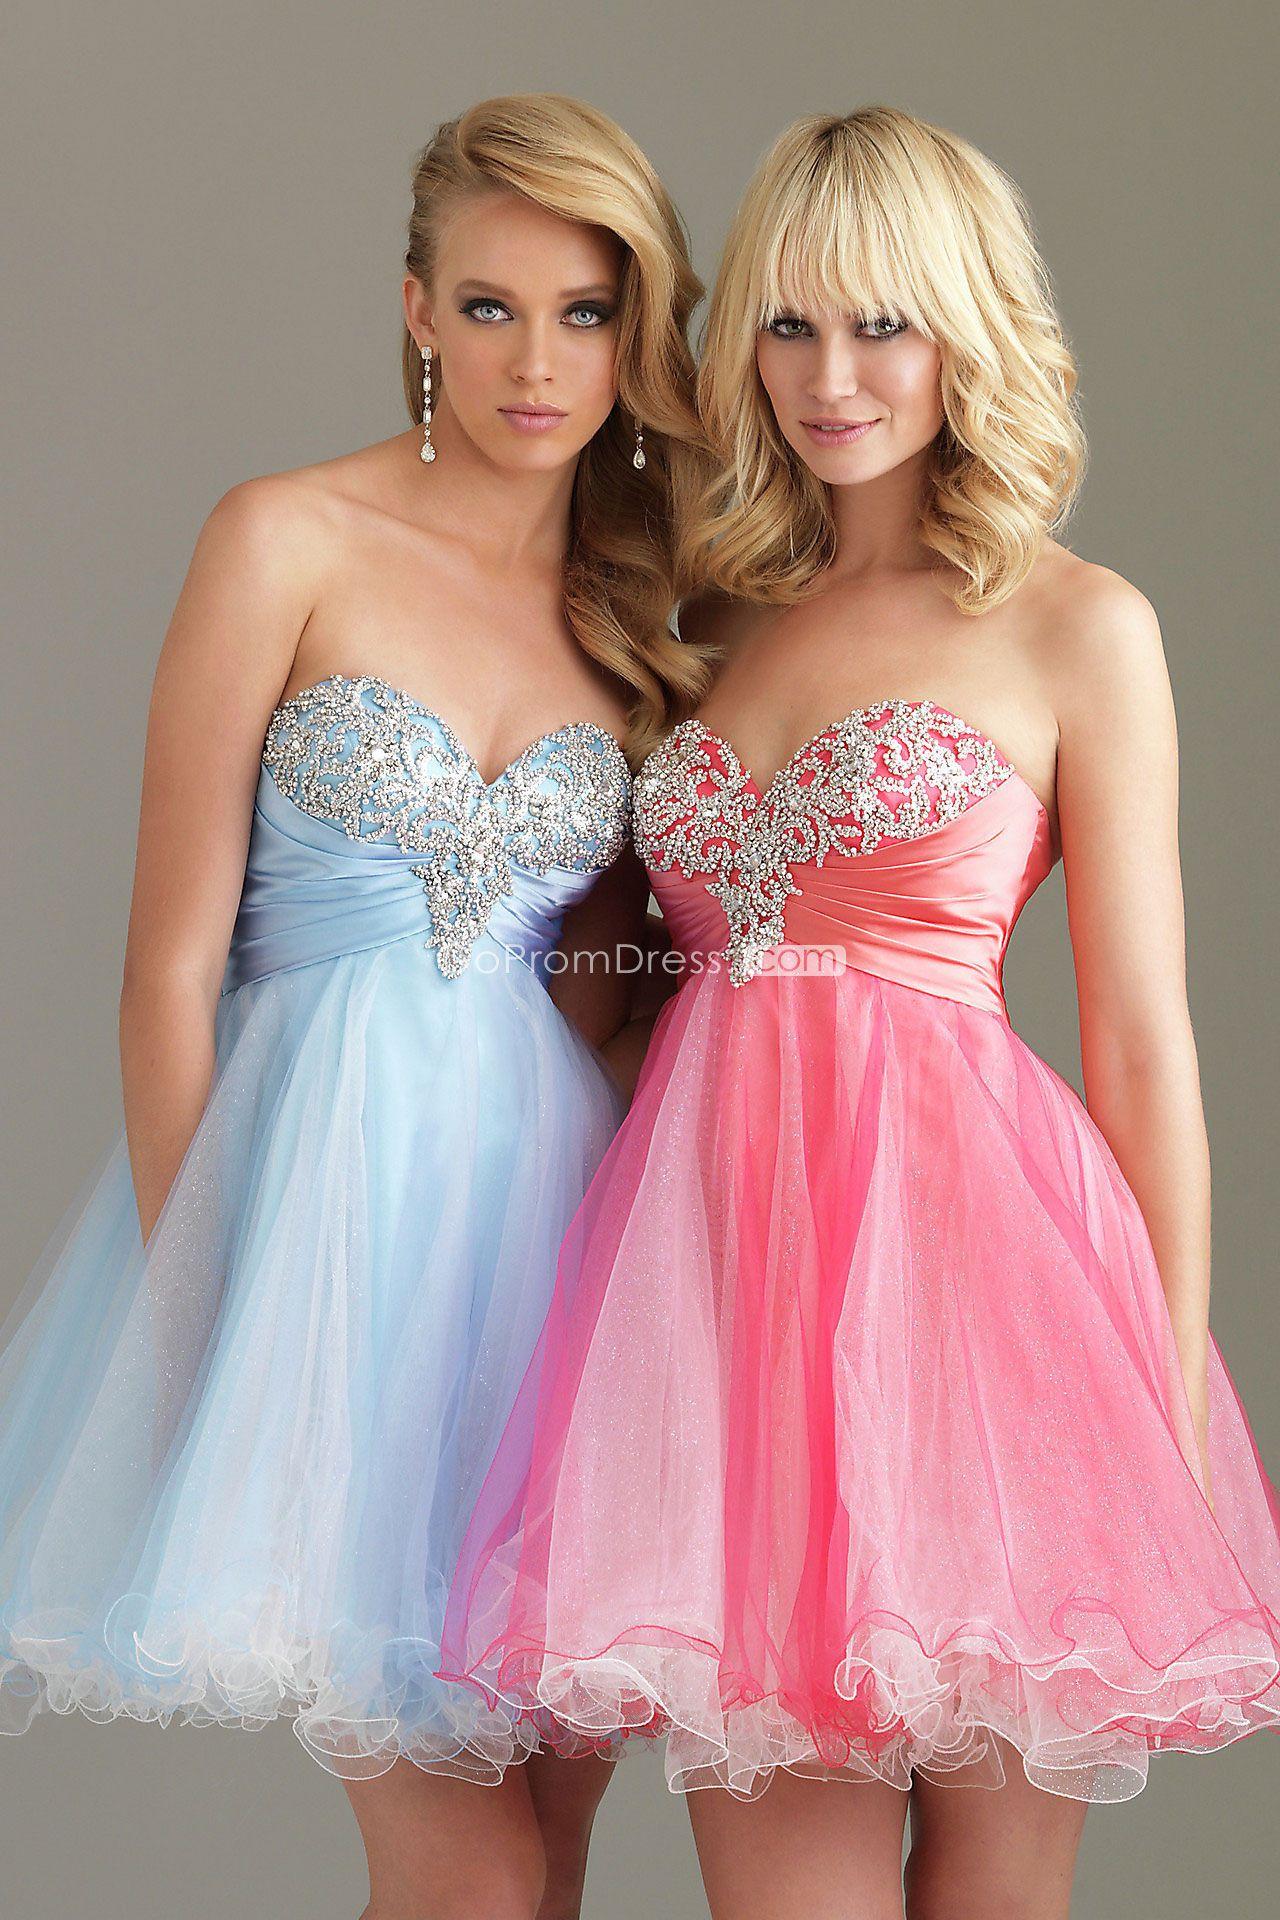 prom dresses prom dresses | Dresses! | Pinterest